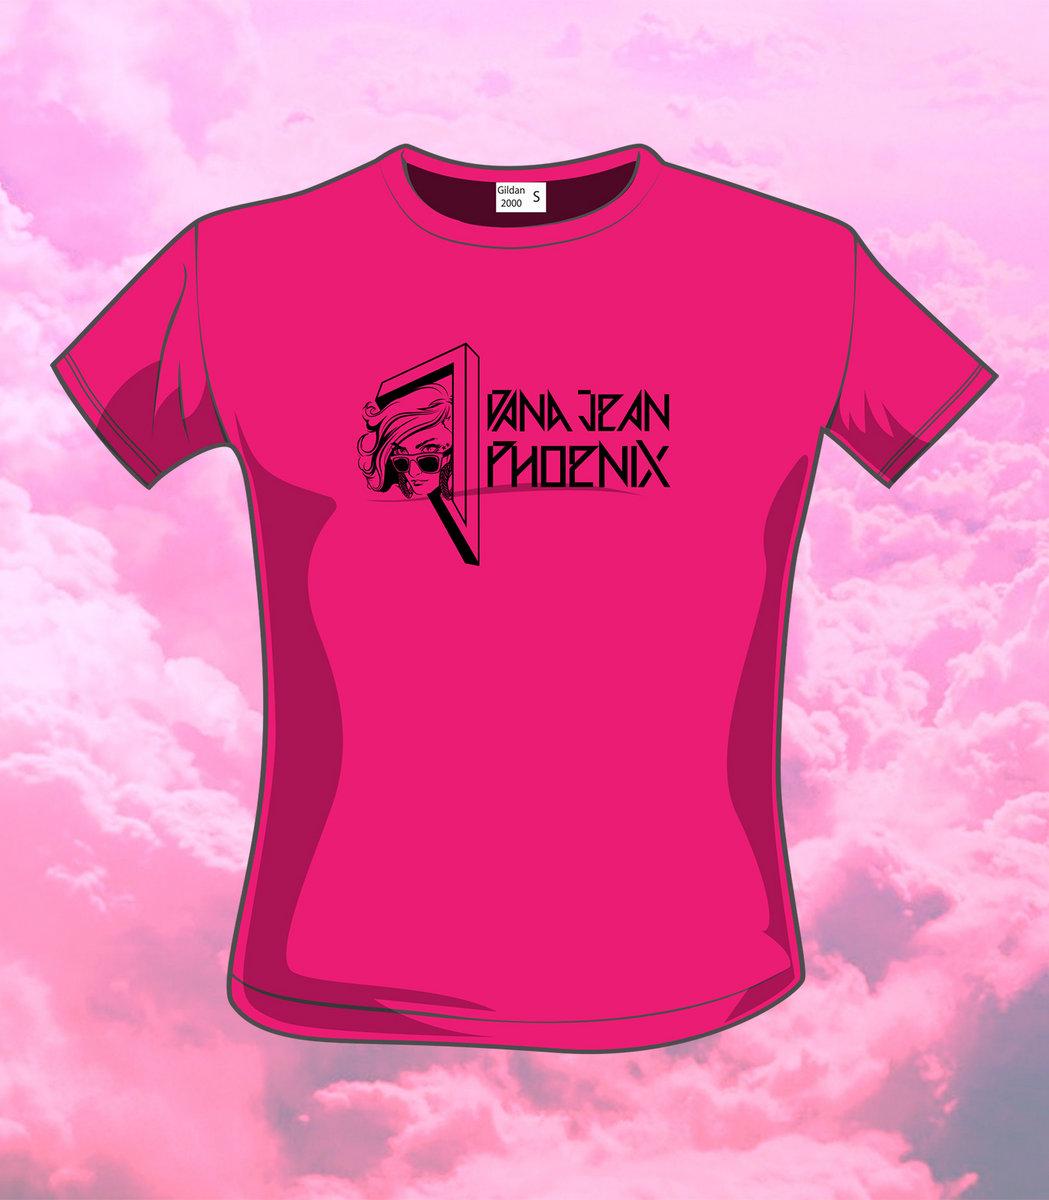 T Shirt Printing In Phx Az - DREAMWORKS